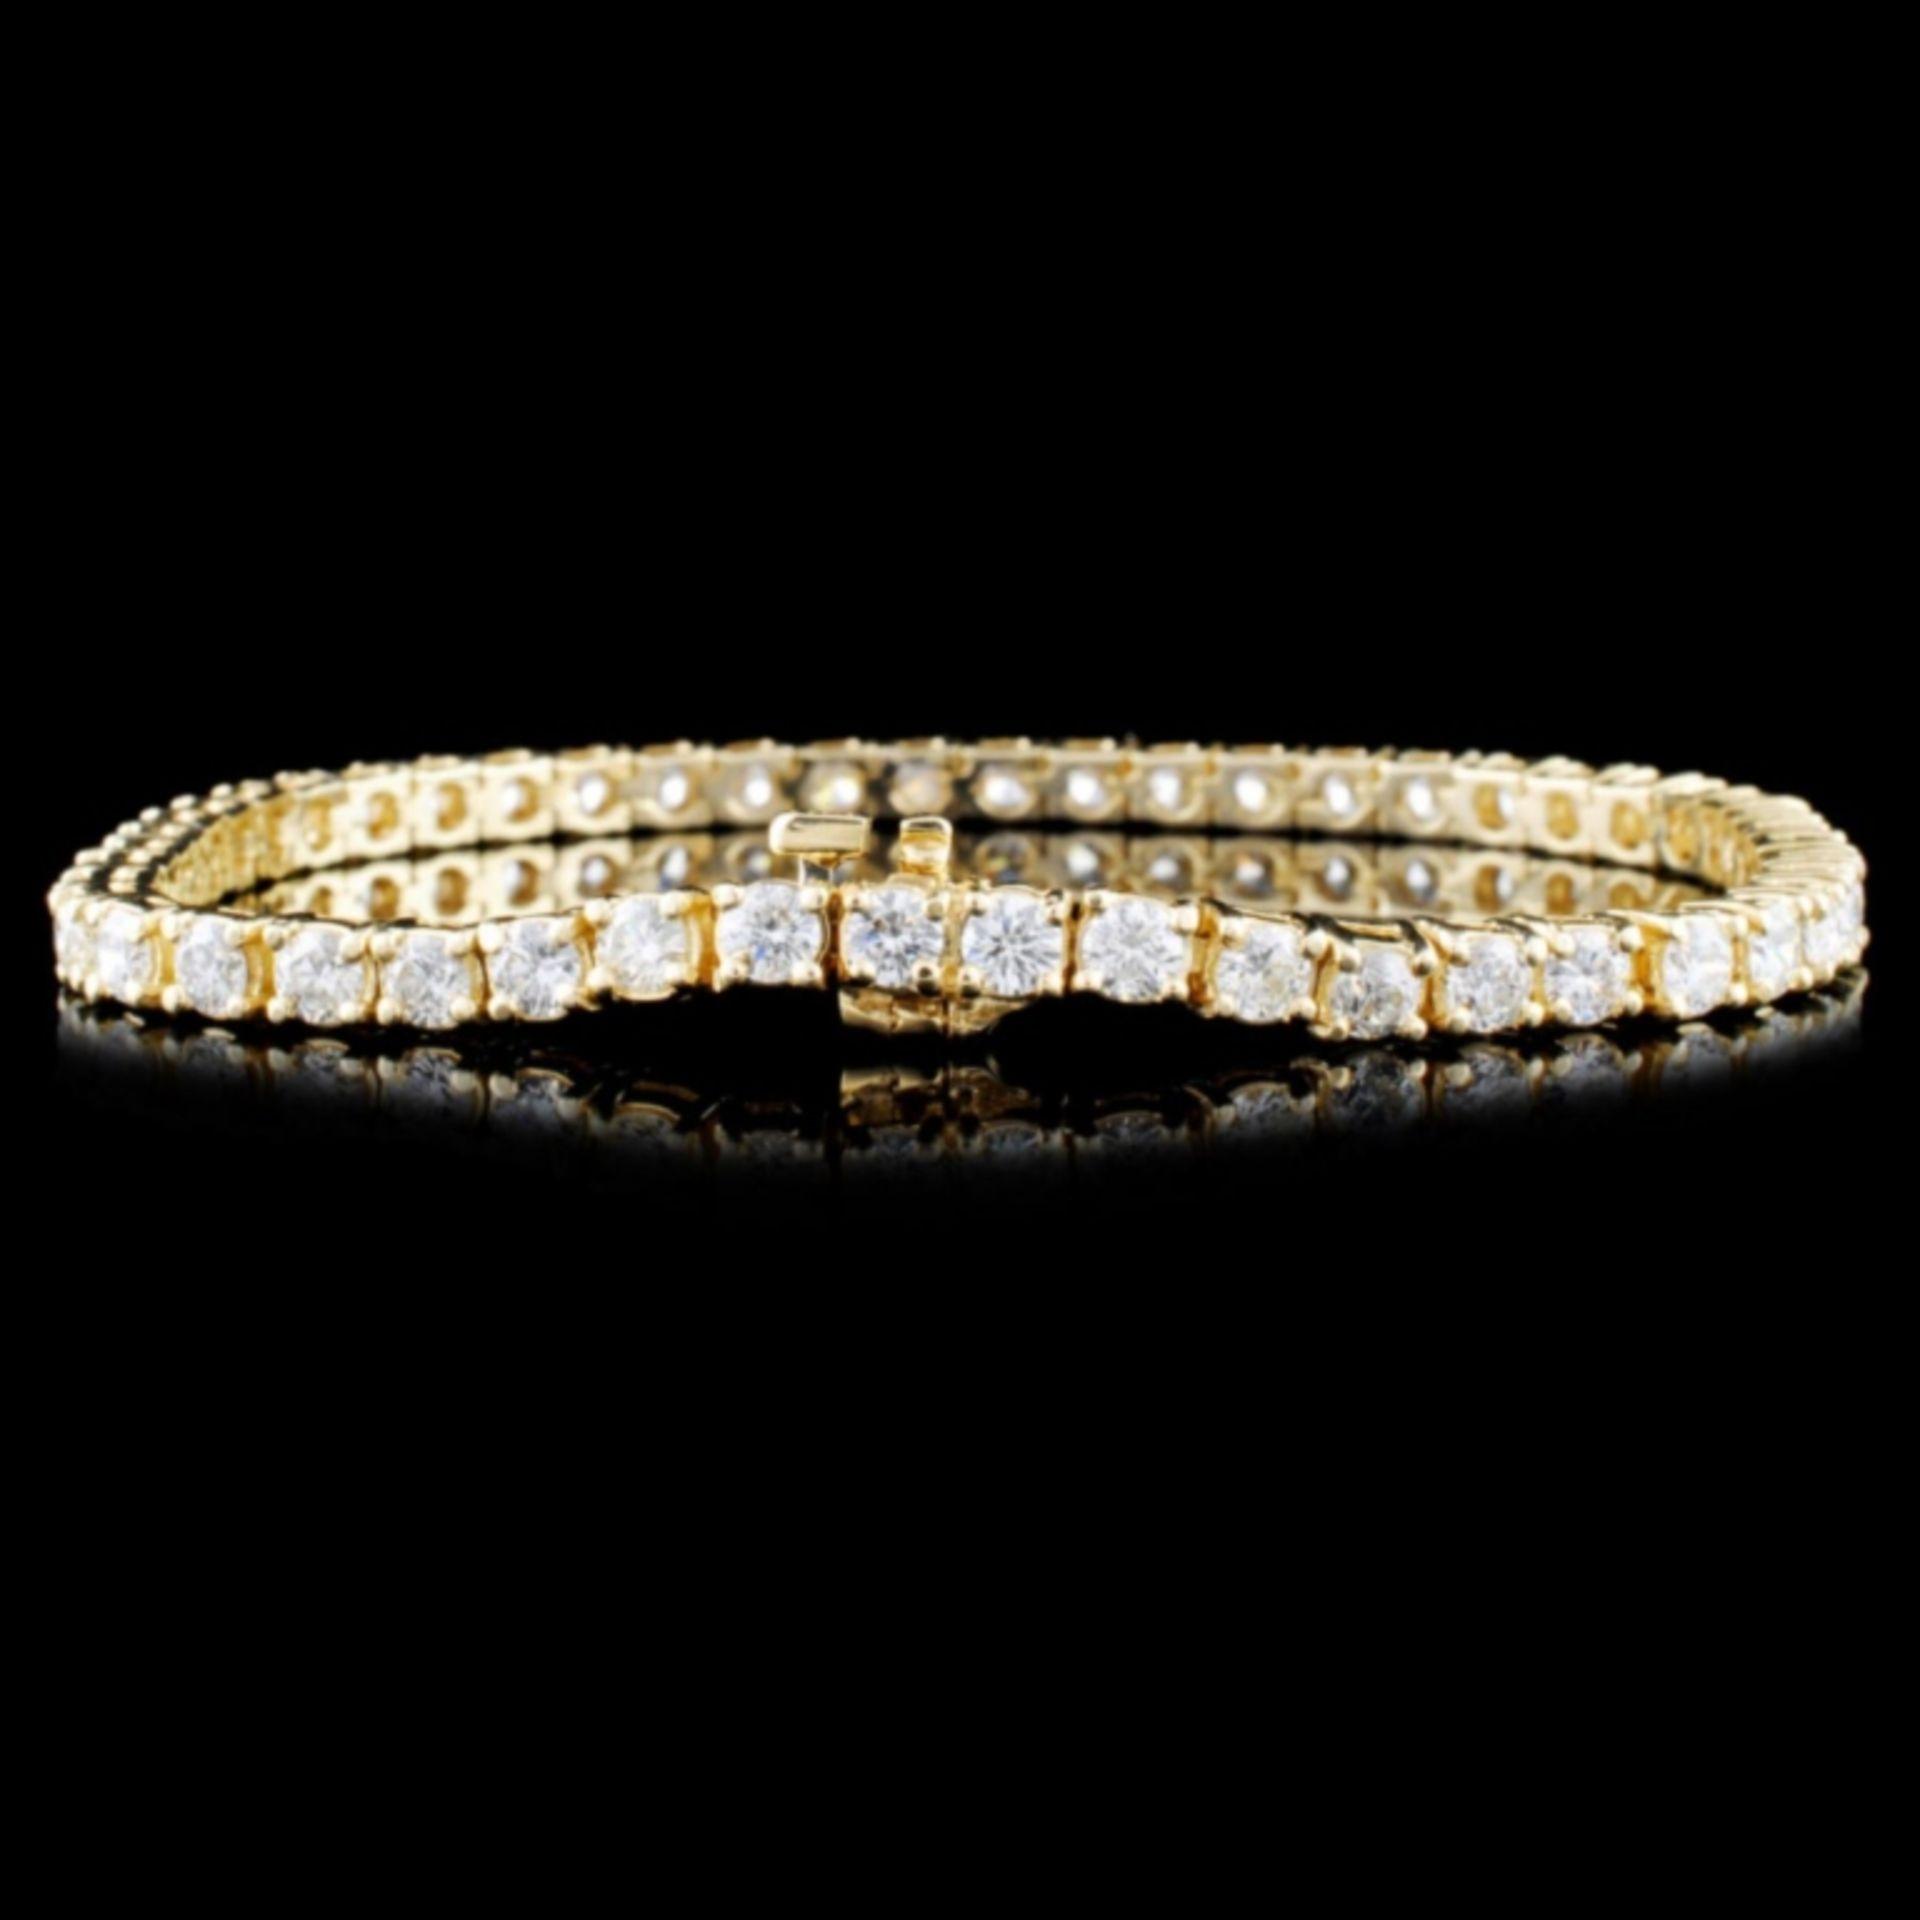 14K Gold 5.16ctw Diamond Bracelet - Image 2 of 3